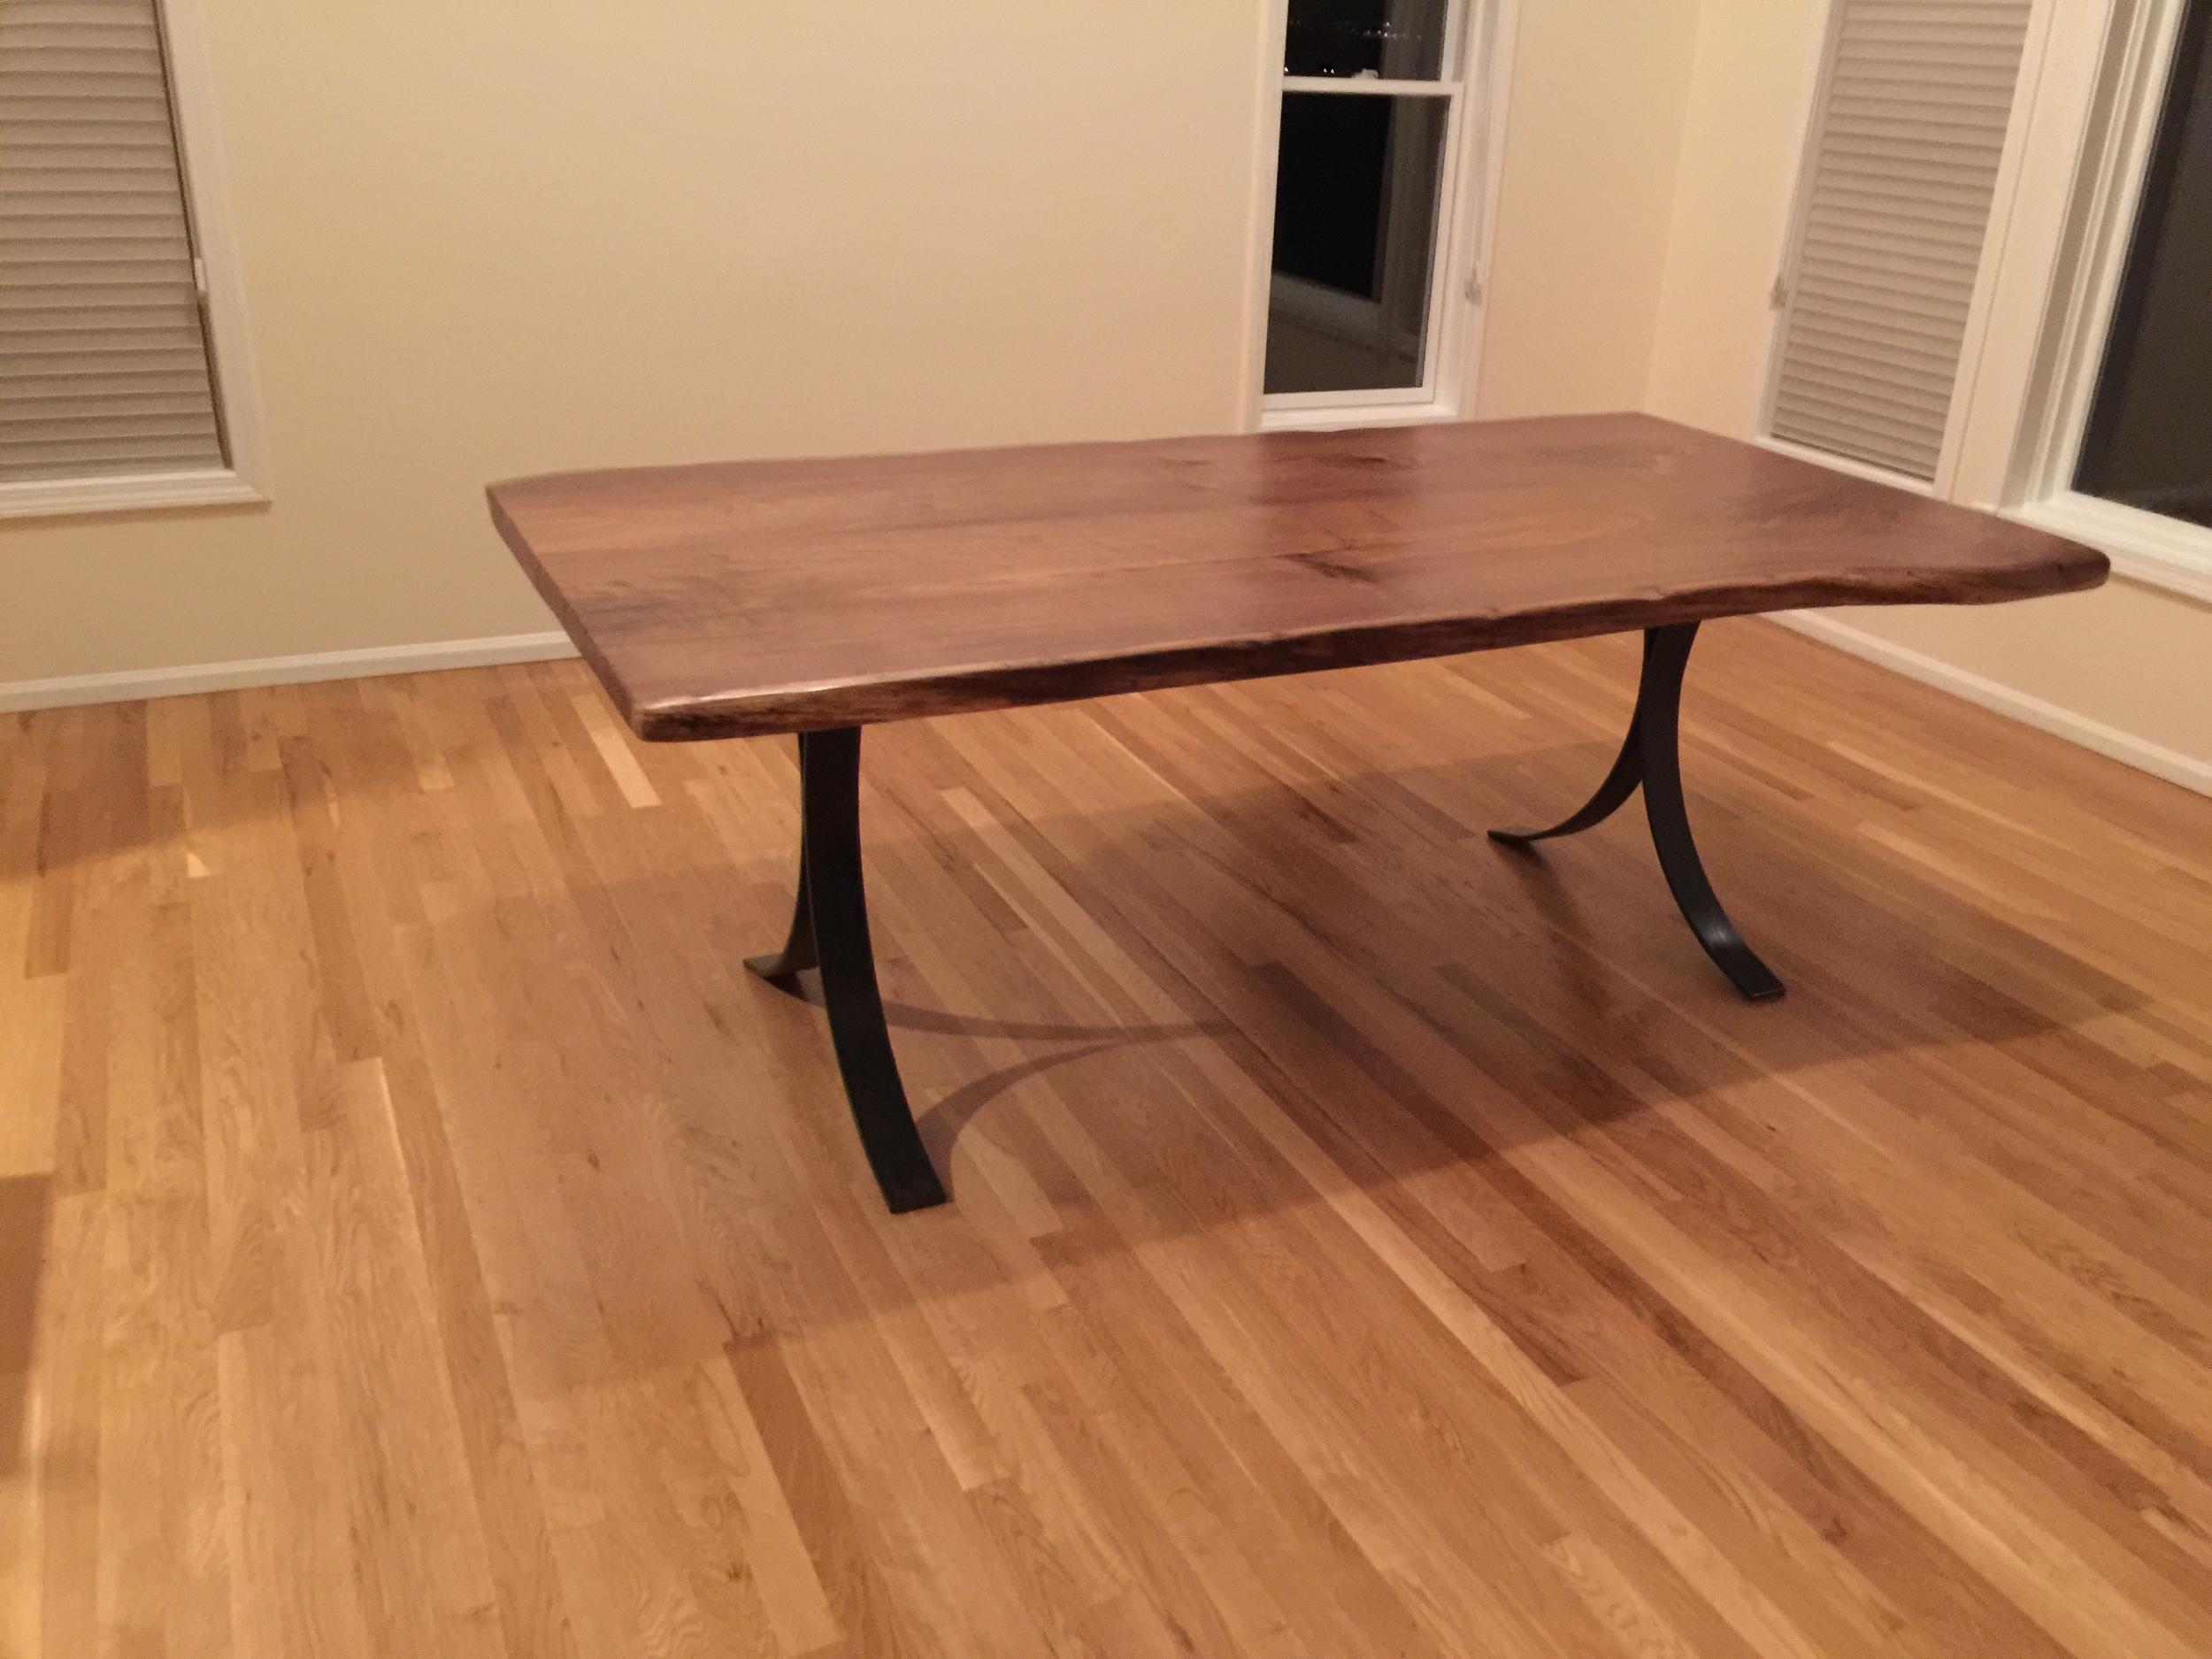 Subtle Edge Walnut Dining Table